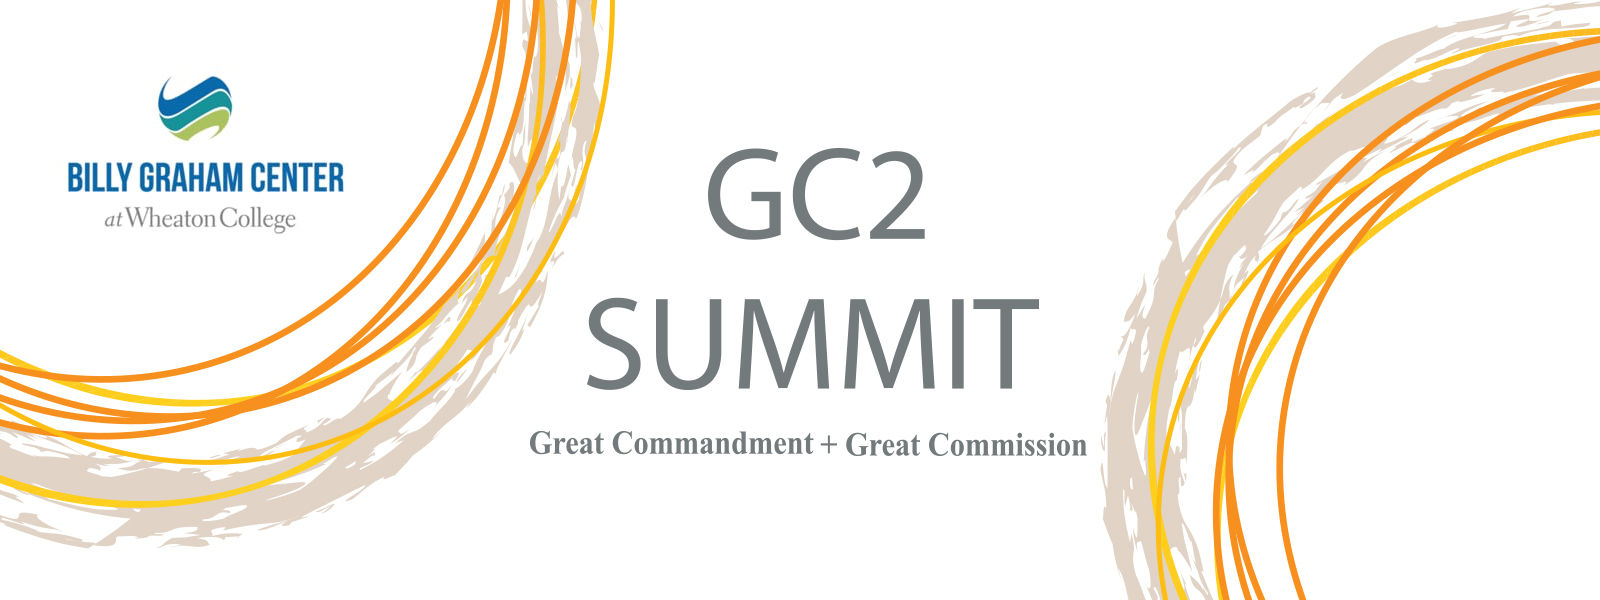 GC2 Summit on Mass Incarceration